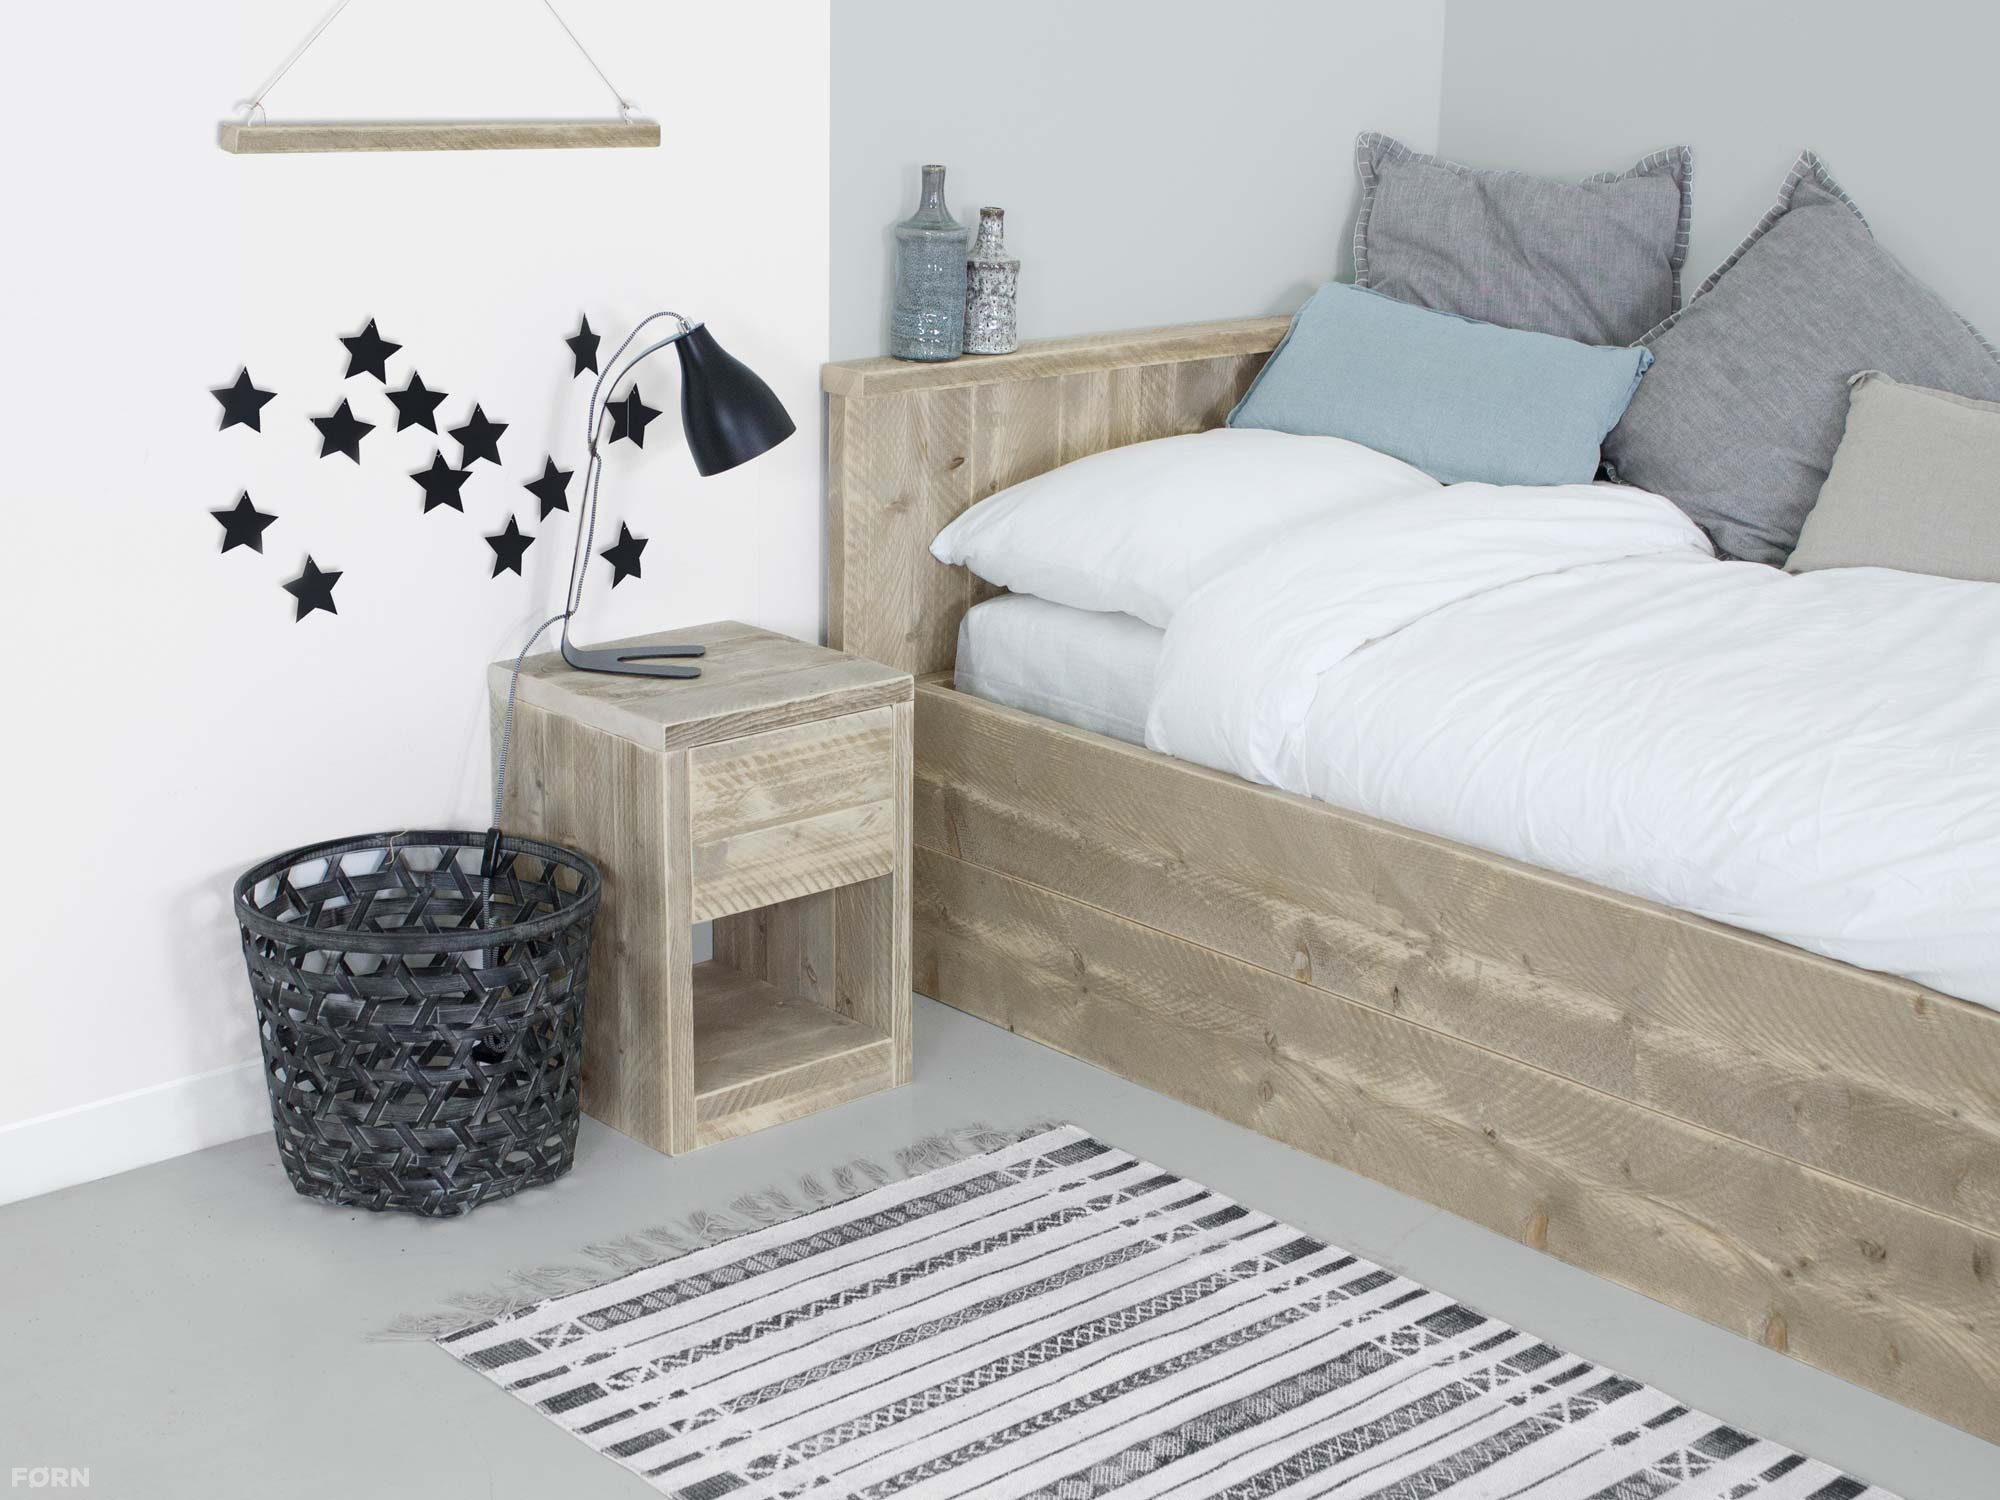 bauholz nachtschrank mit schublade bauholz nachttische bauholz betten. Black Bedroom Furniture Sets. Home Design Ideas